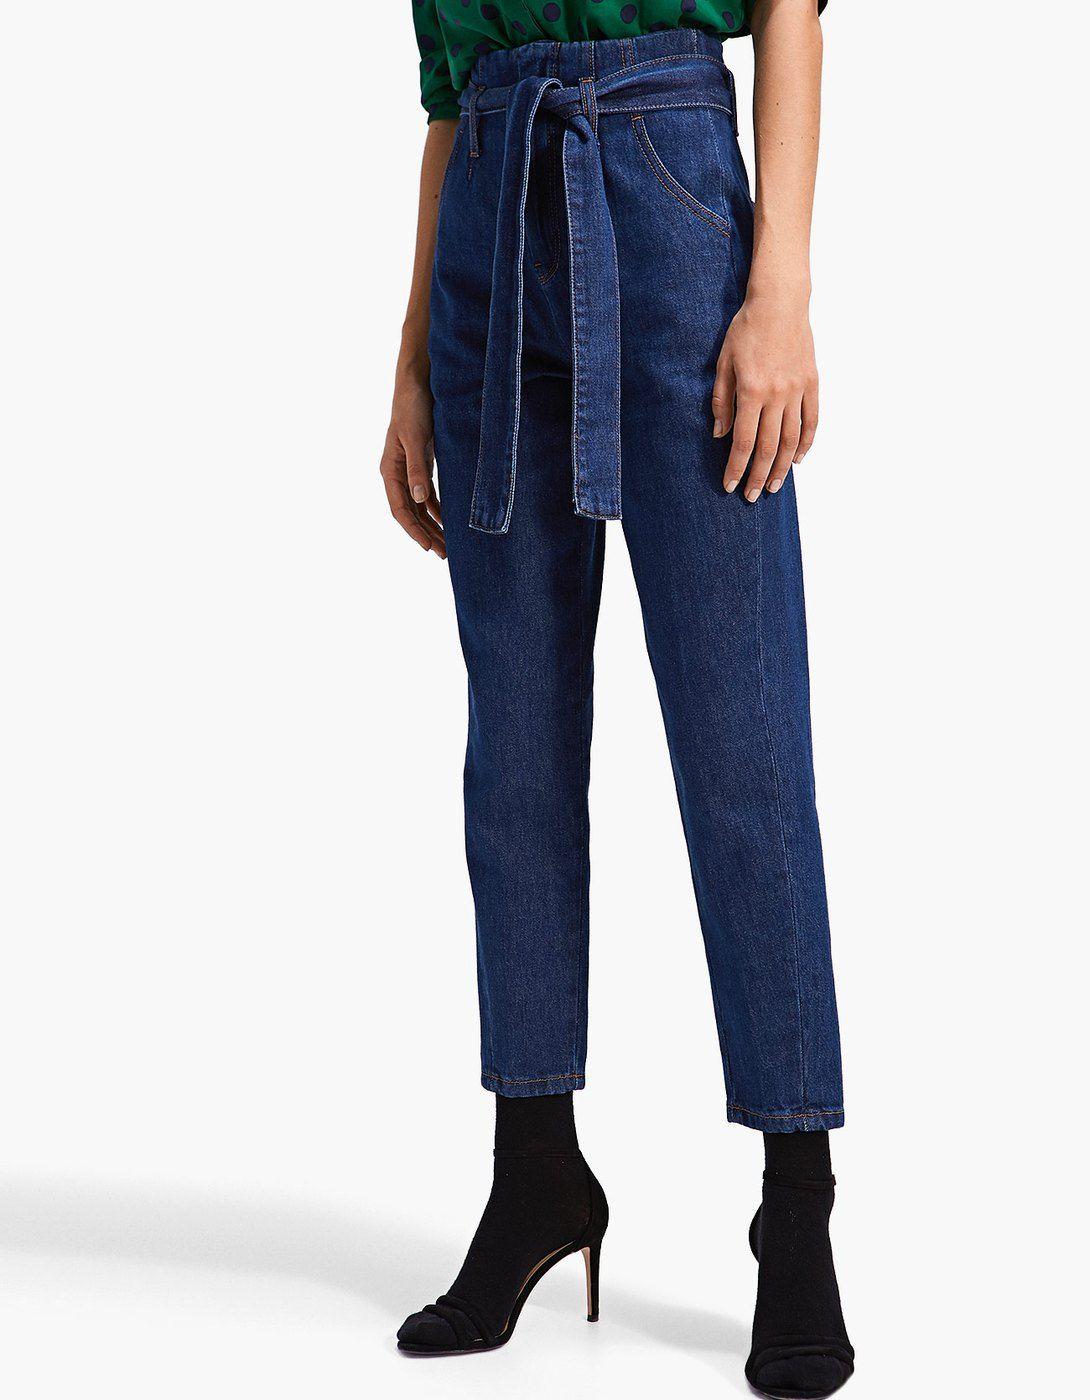 bdeee16d4c8 Paperbag jeans - Denim Fit Guide